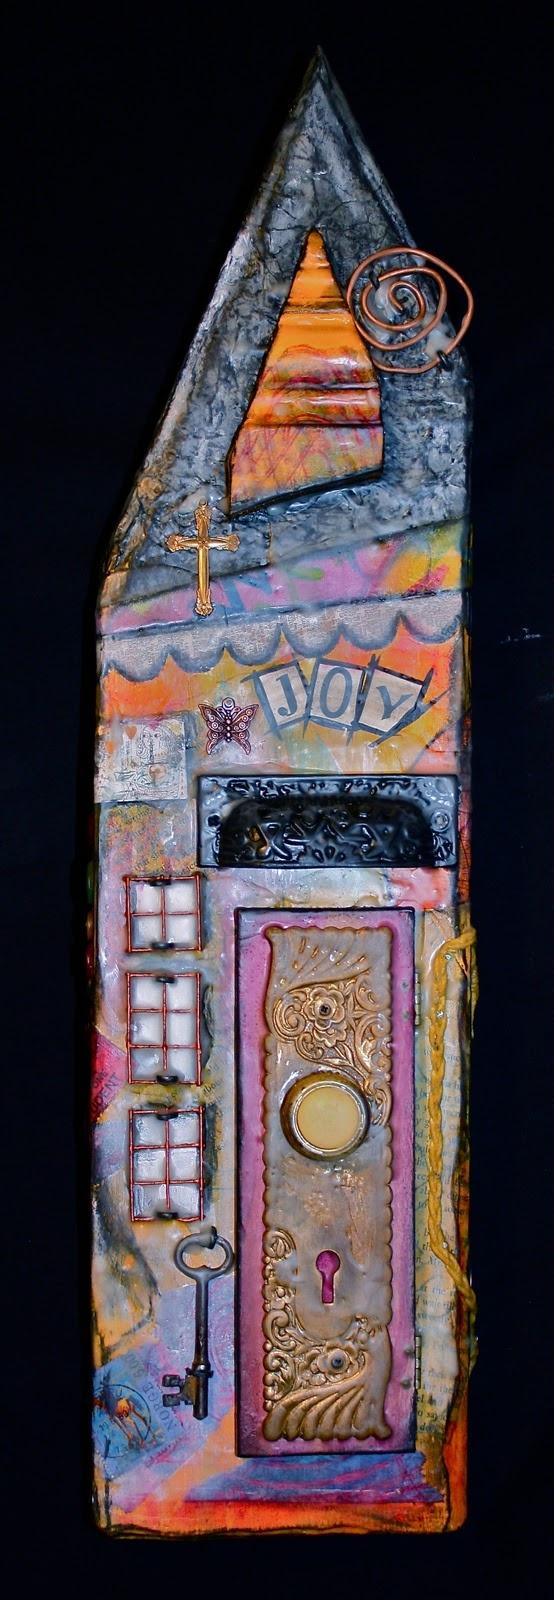 Michelle Leech Art: Mixed Media Houses That Inspire